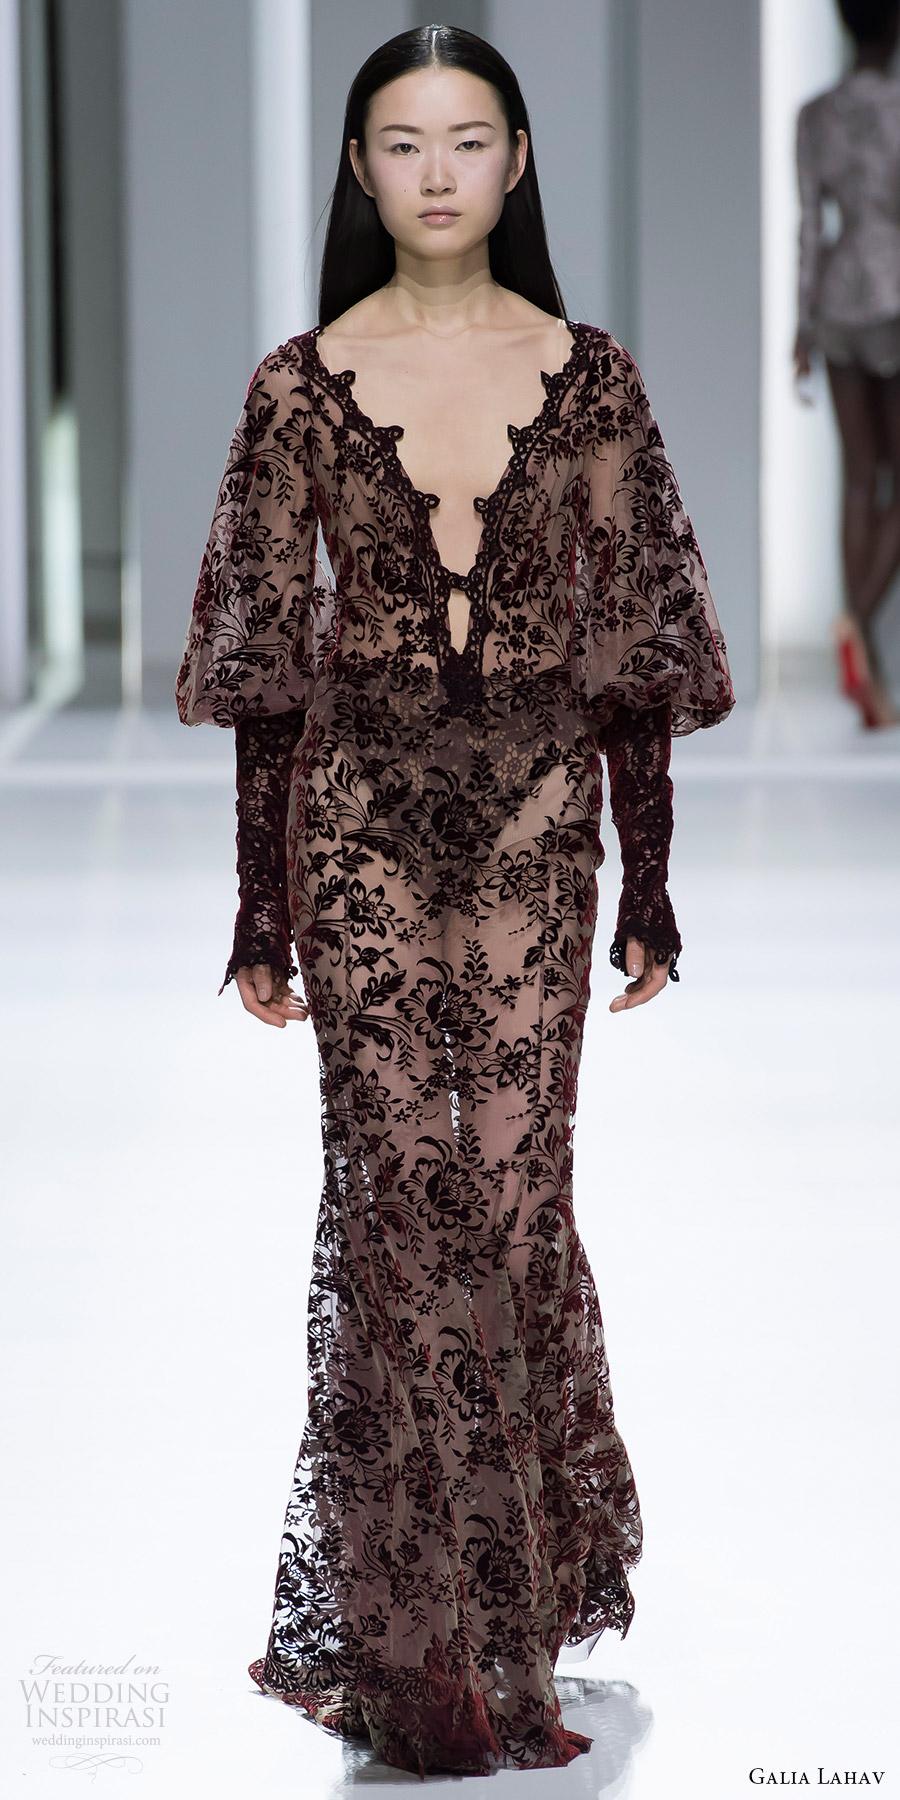 galia lahav haute couture spring 2017 (jamie lynn) gown